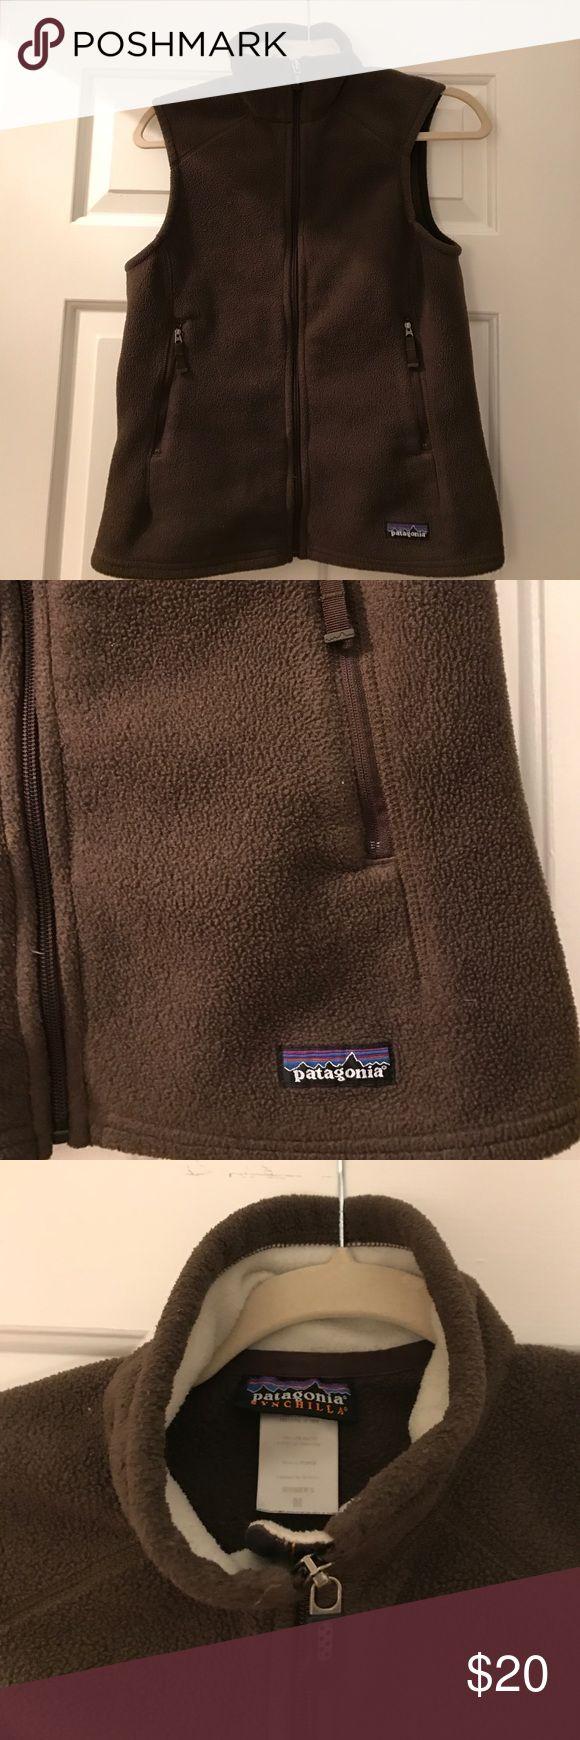 Patagonia Fleece Vest size M Gently worn. Fleece Vest. Brown. Patagonia Tops Sweatshirts & Hoodies